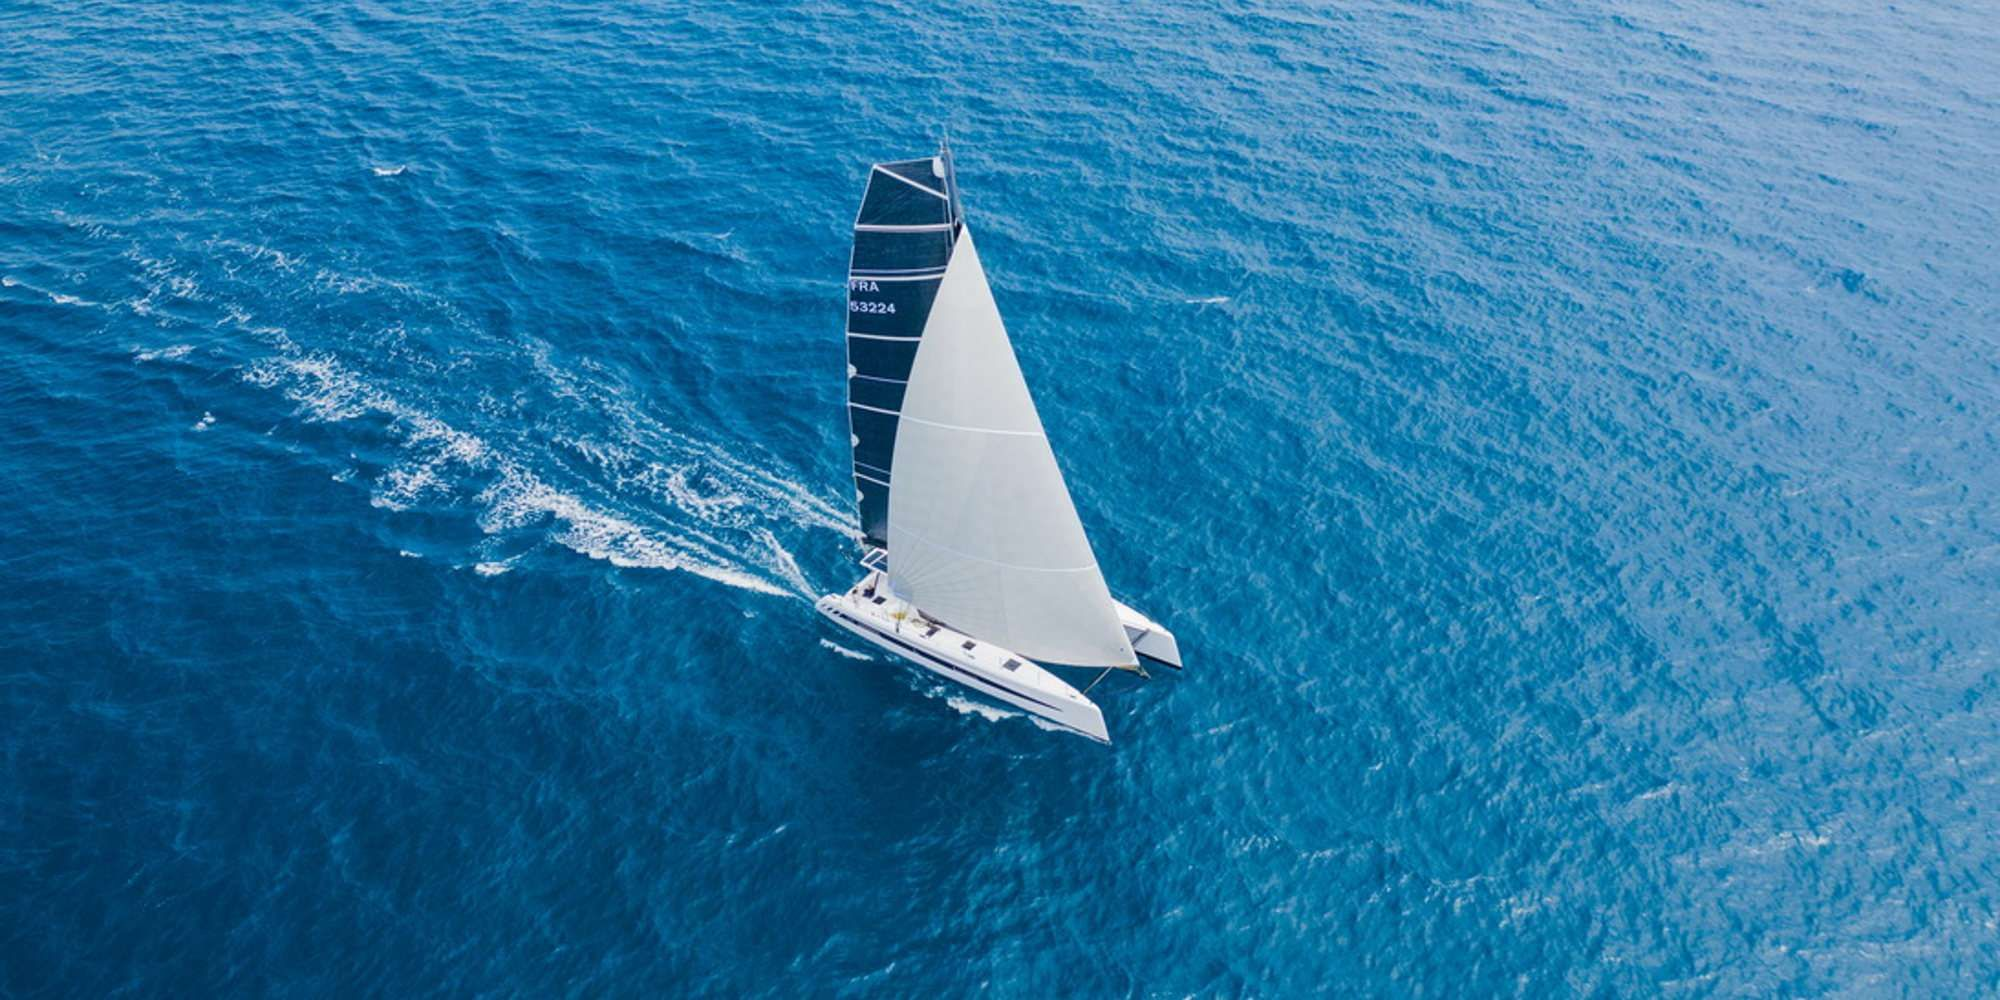 GIVE ME FIVE - Outremer 55 - 3 Cabins - Marseille - St Tropez - Porto Cervo - Malta - St Lucia